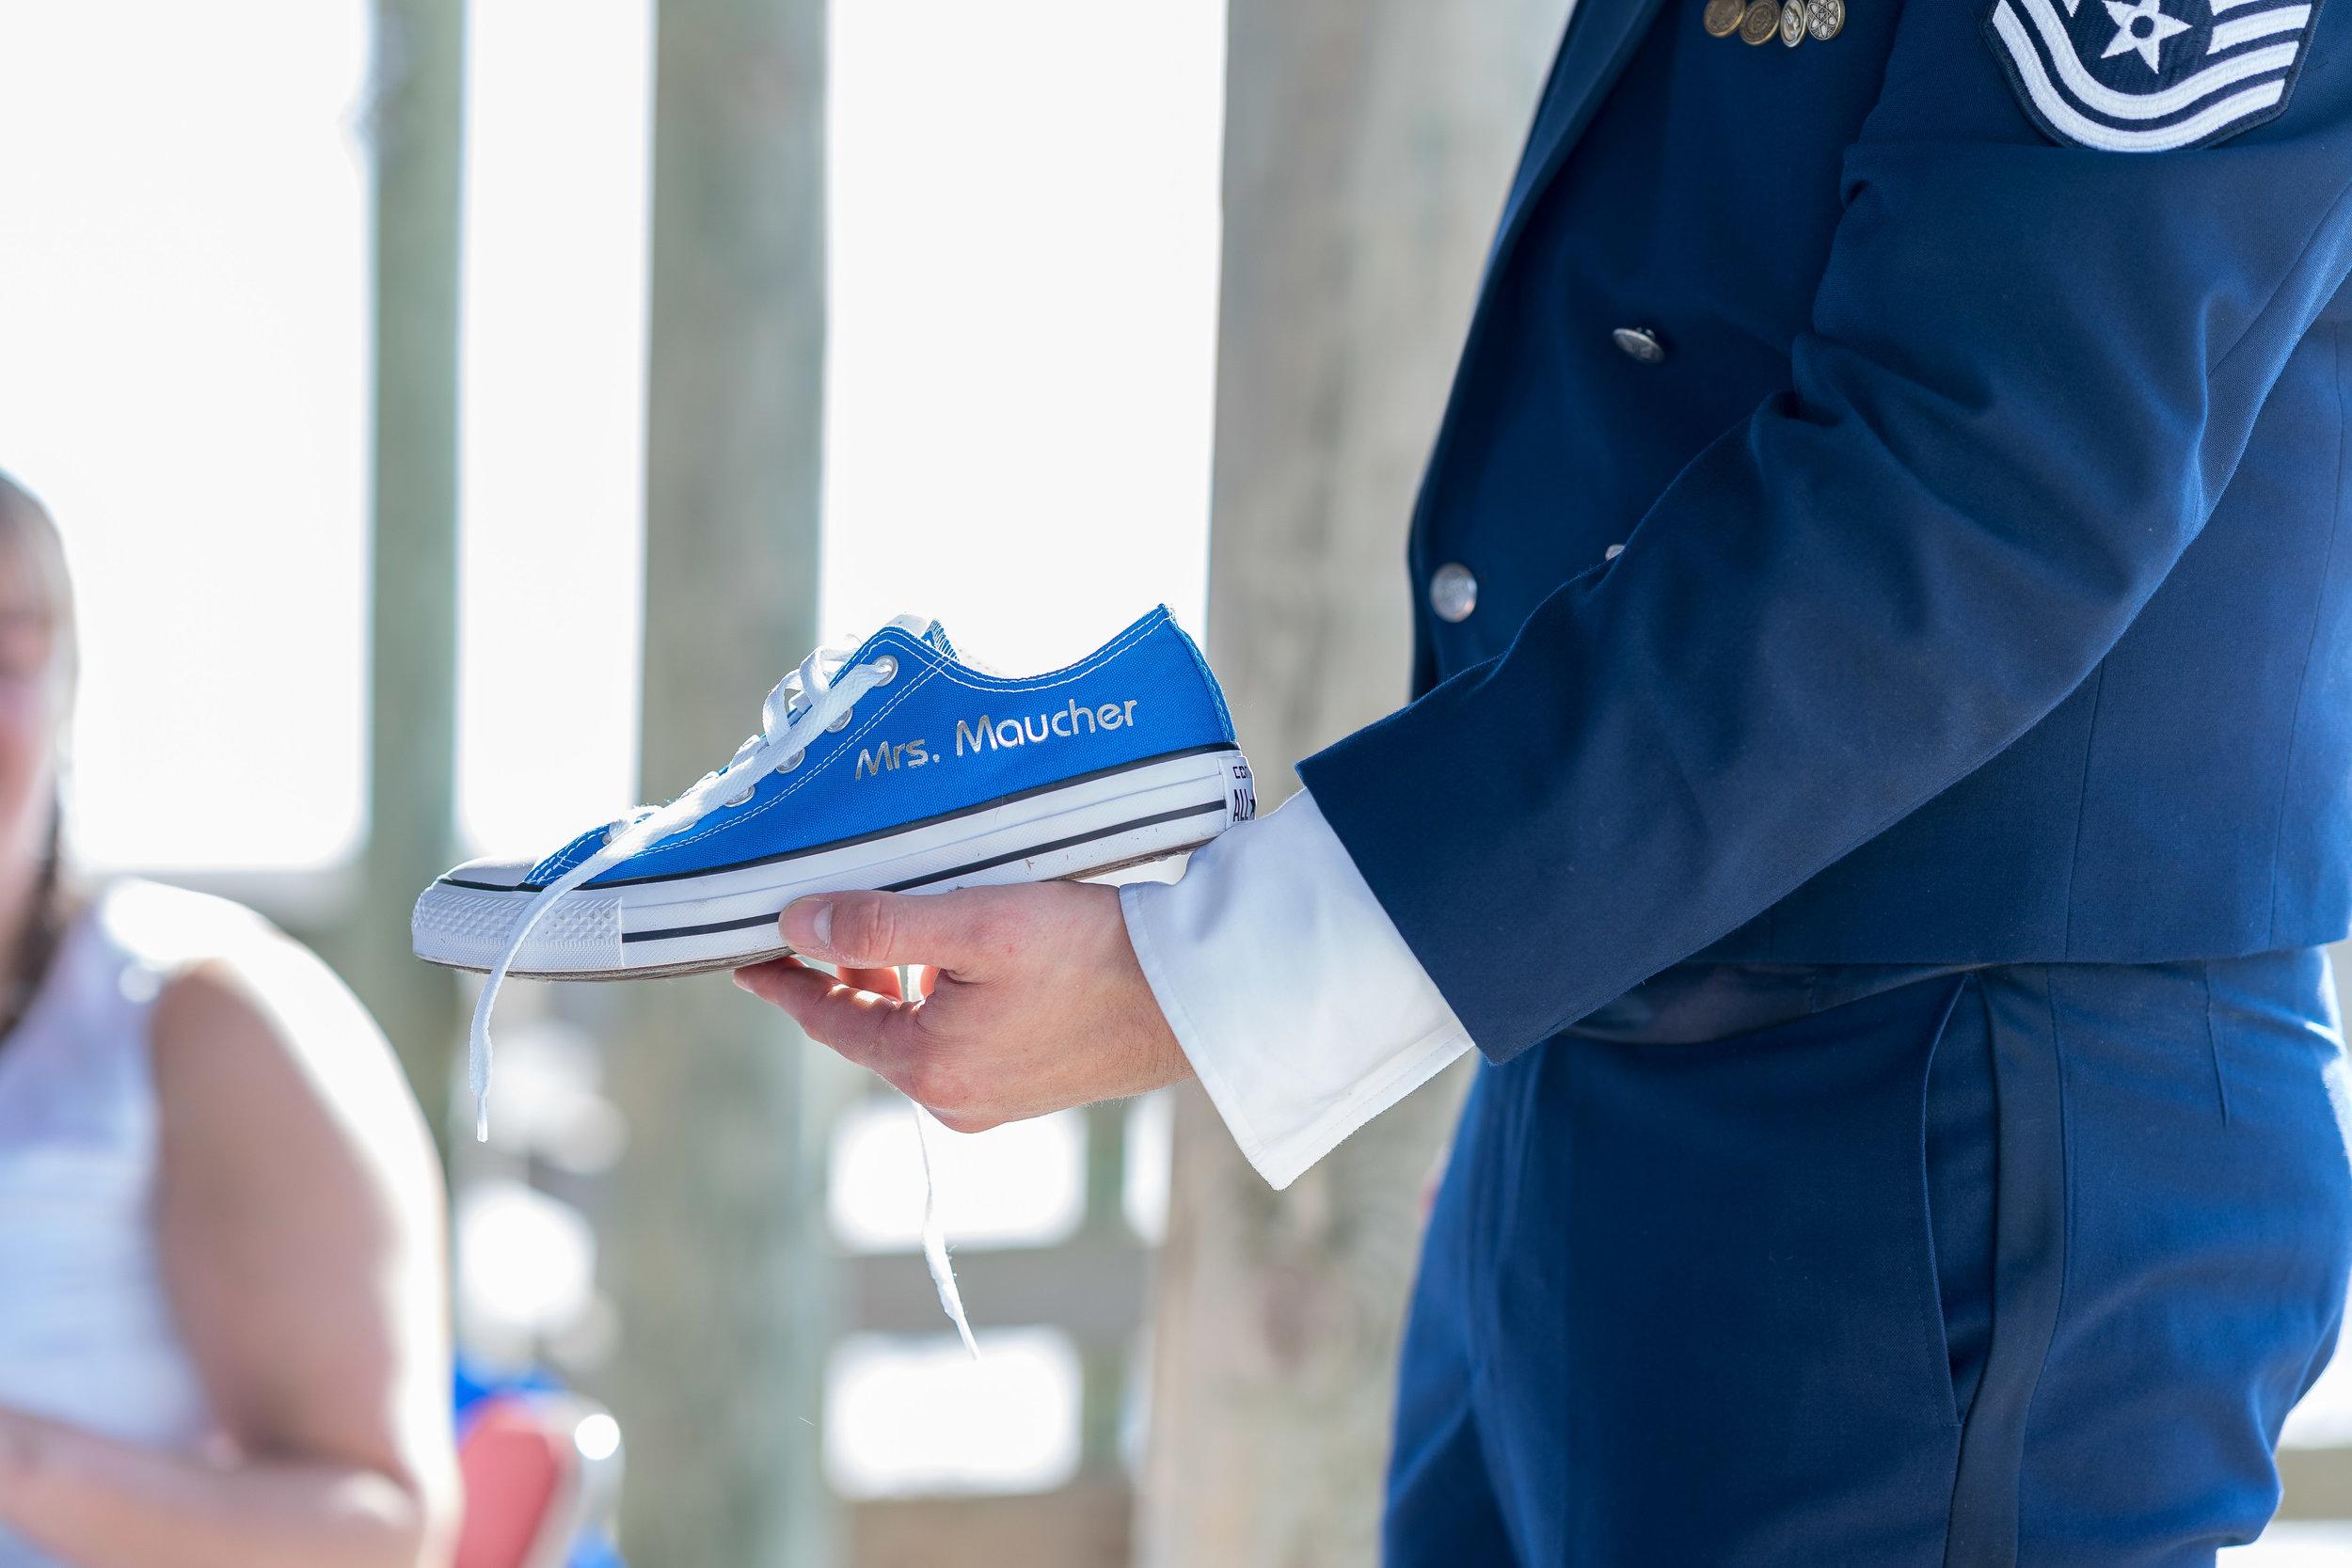 image of blue converse held by groom